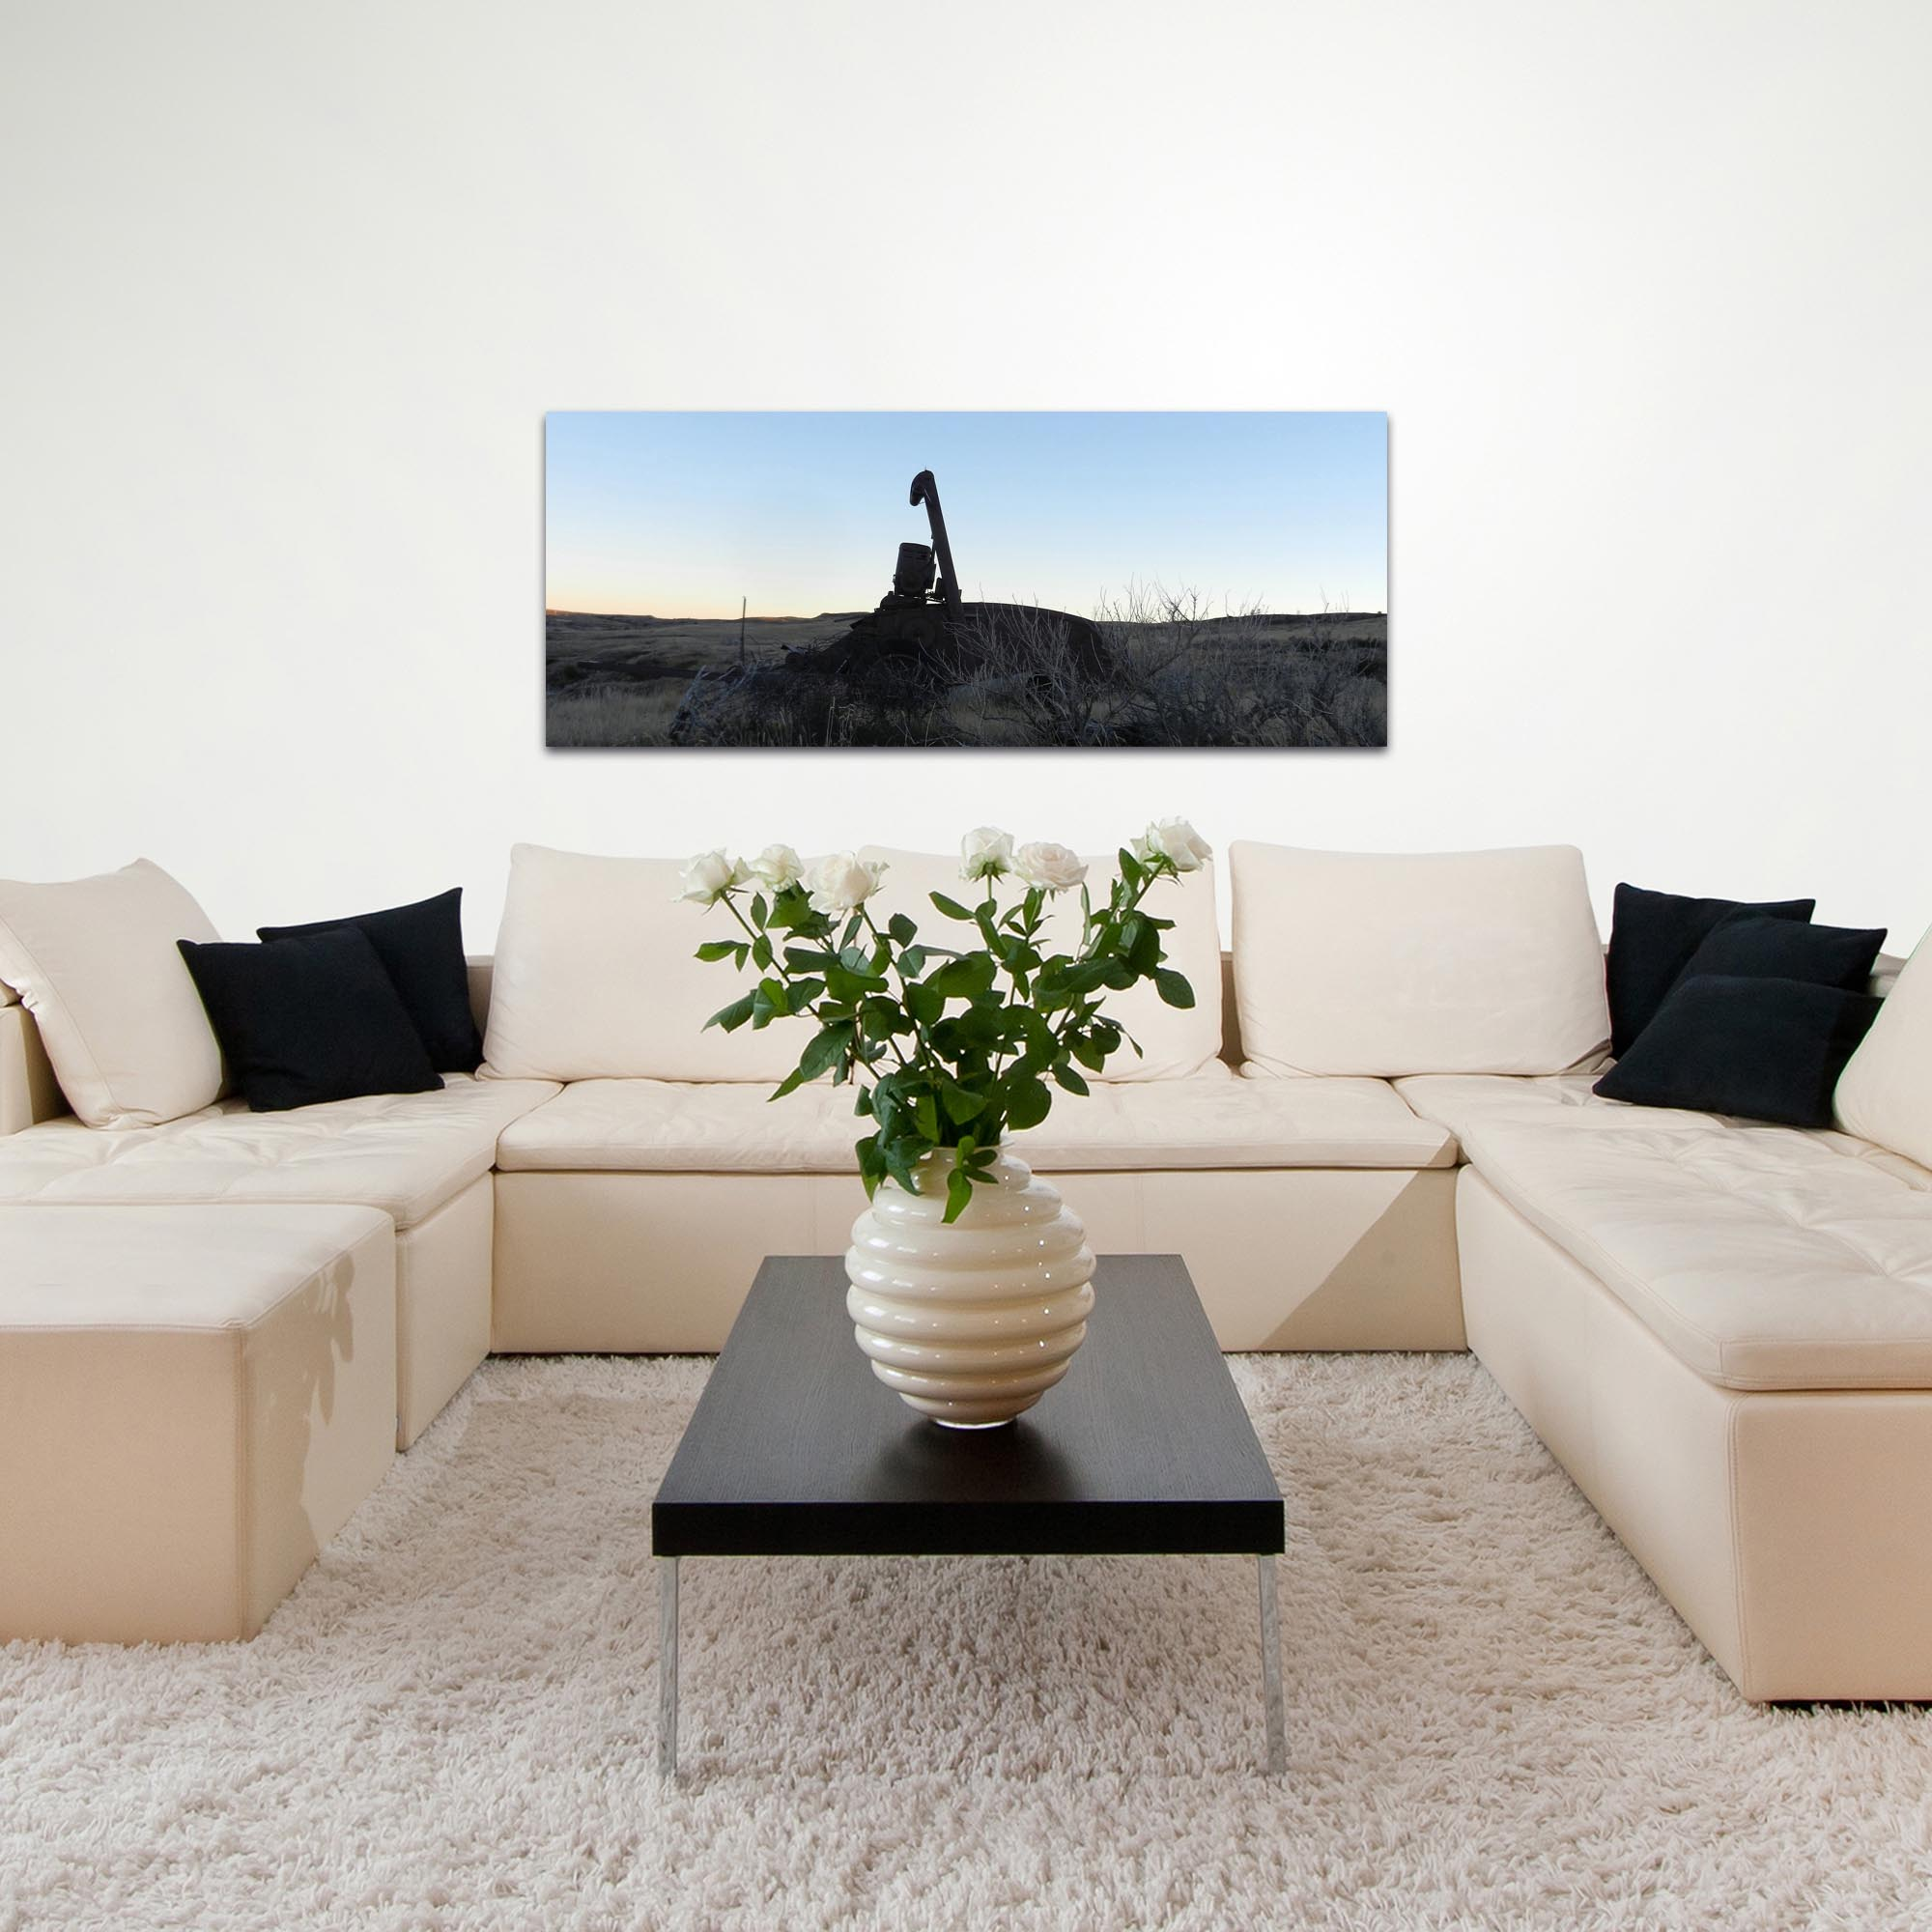 Western Wall Art 'Tractor Sunrise' - American West Decor on Metal or Plexiglass - Lifestyle View